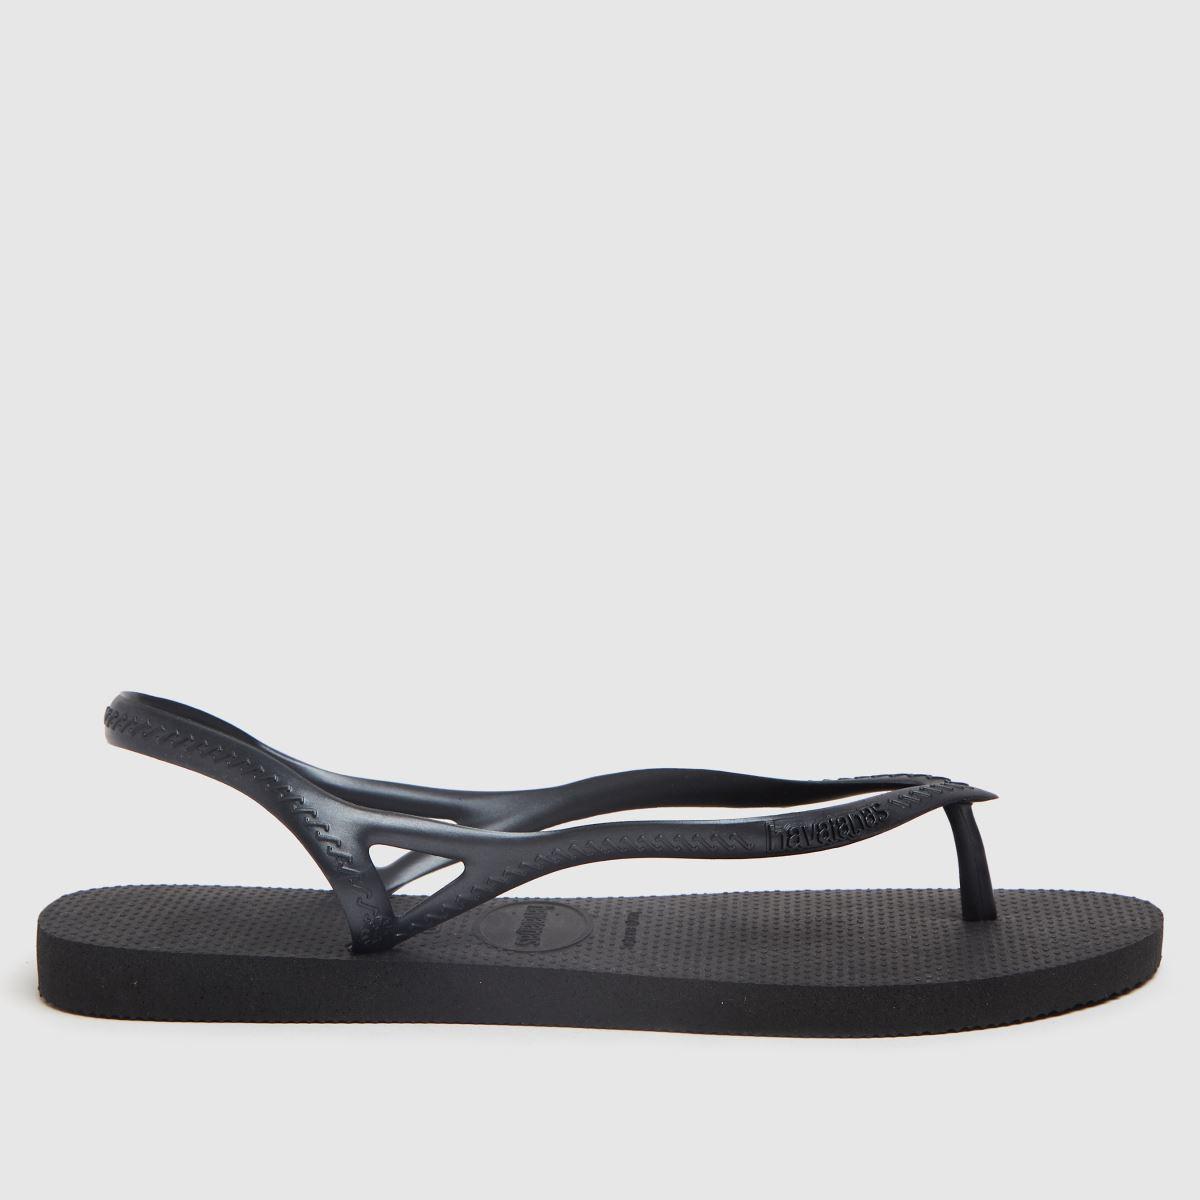 Havaianas Black Sunny Ii Sandals